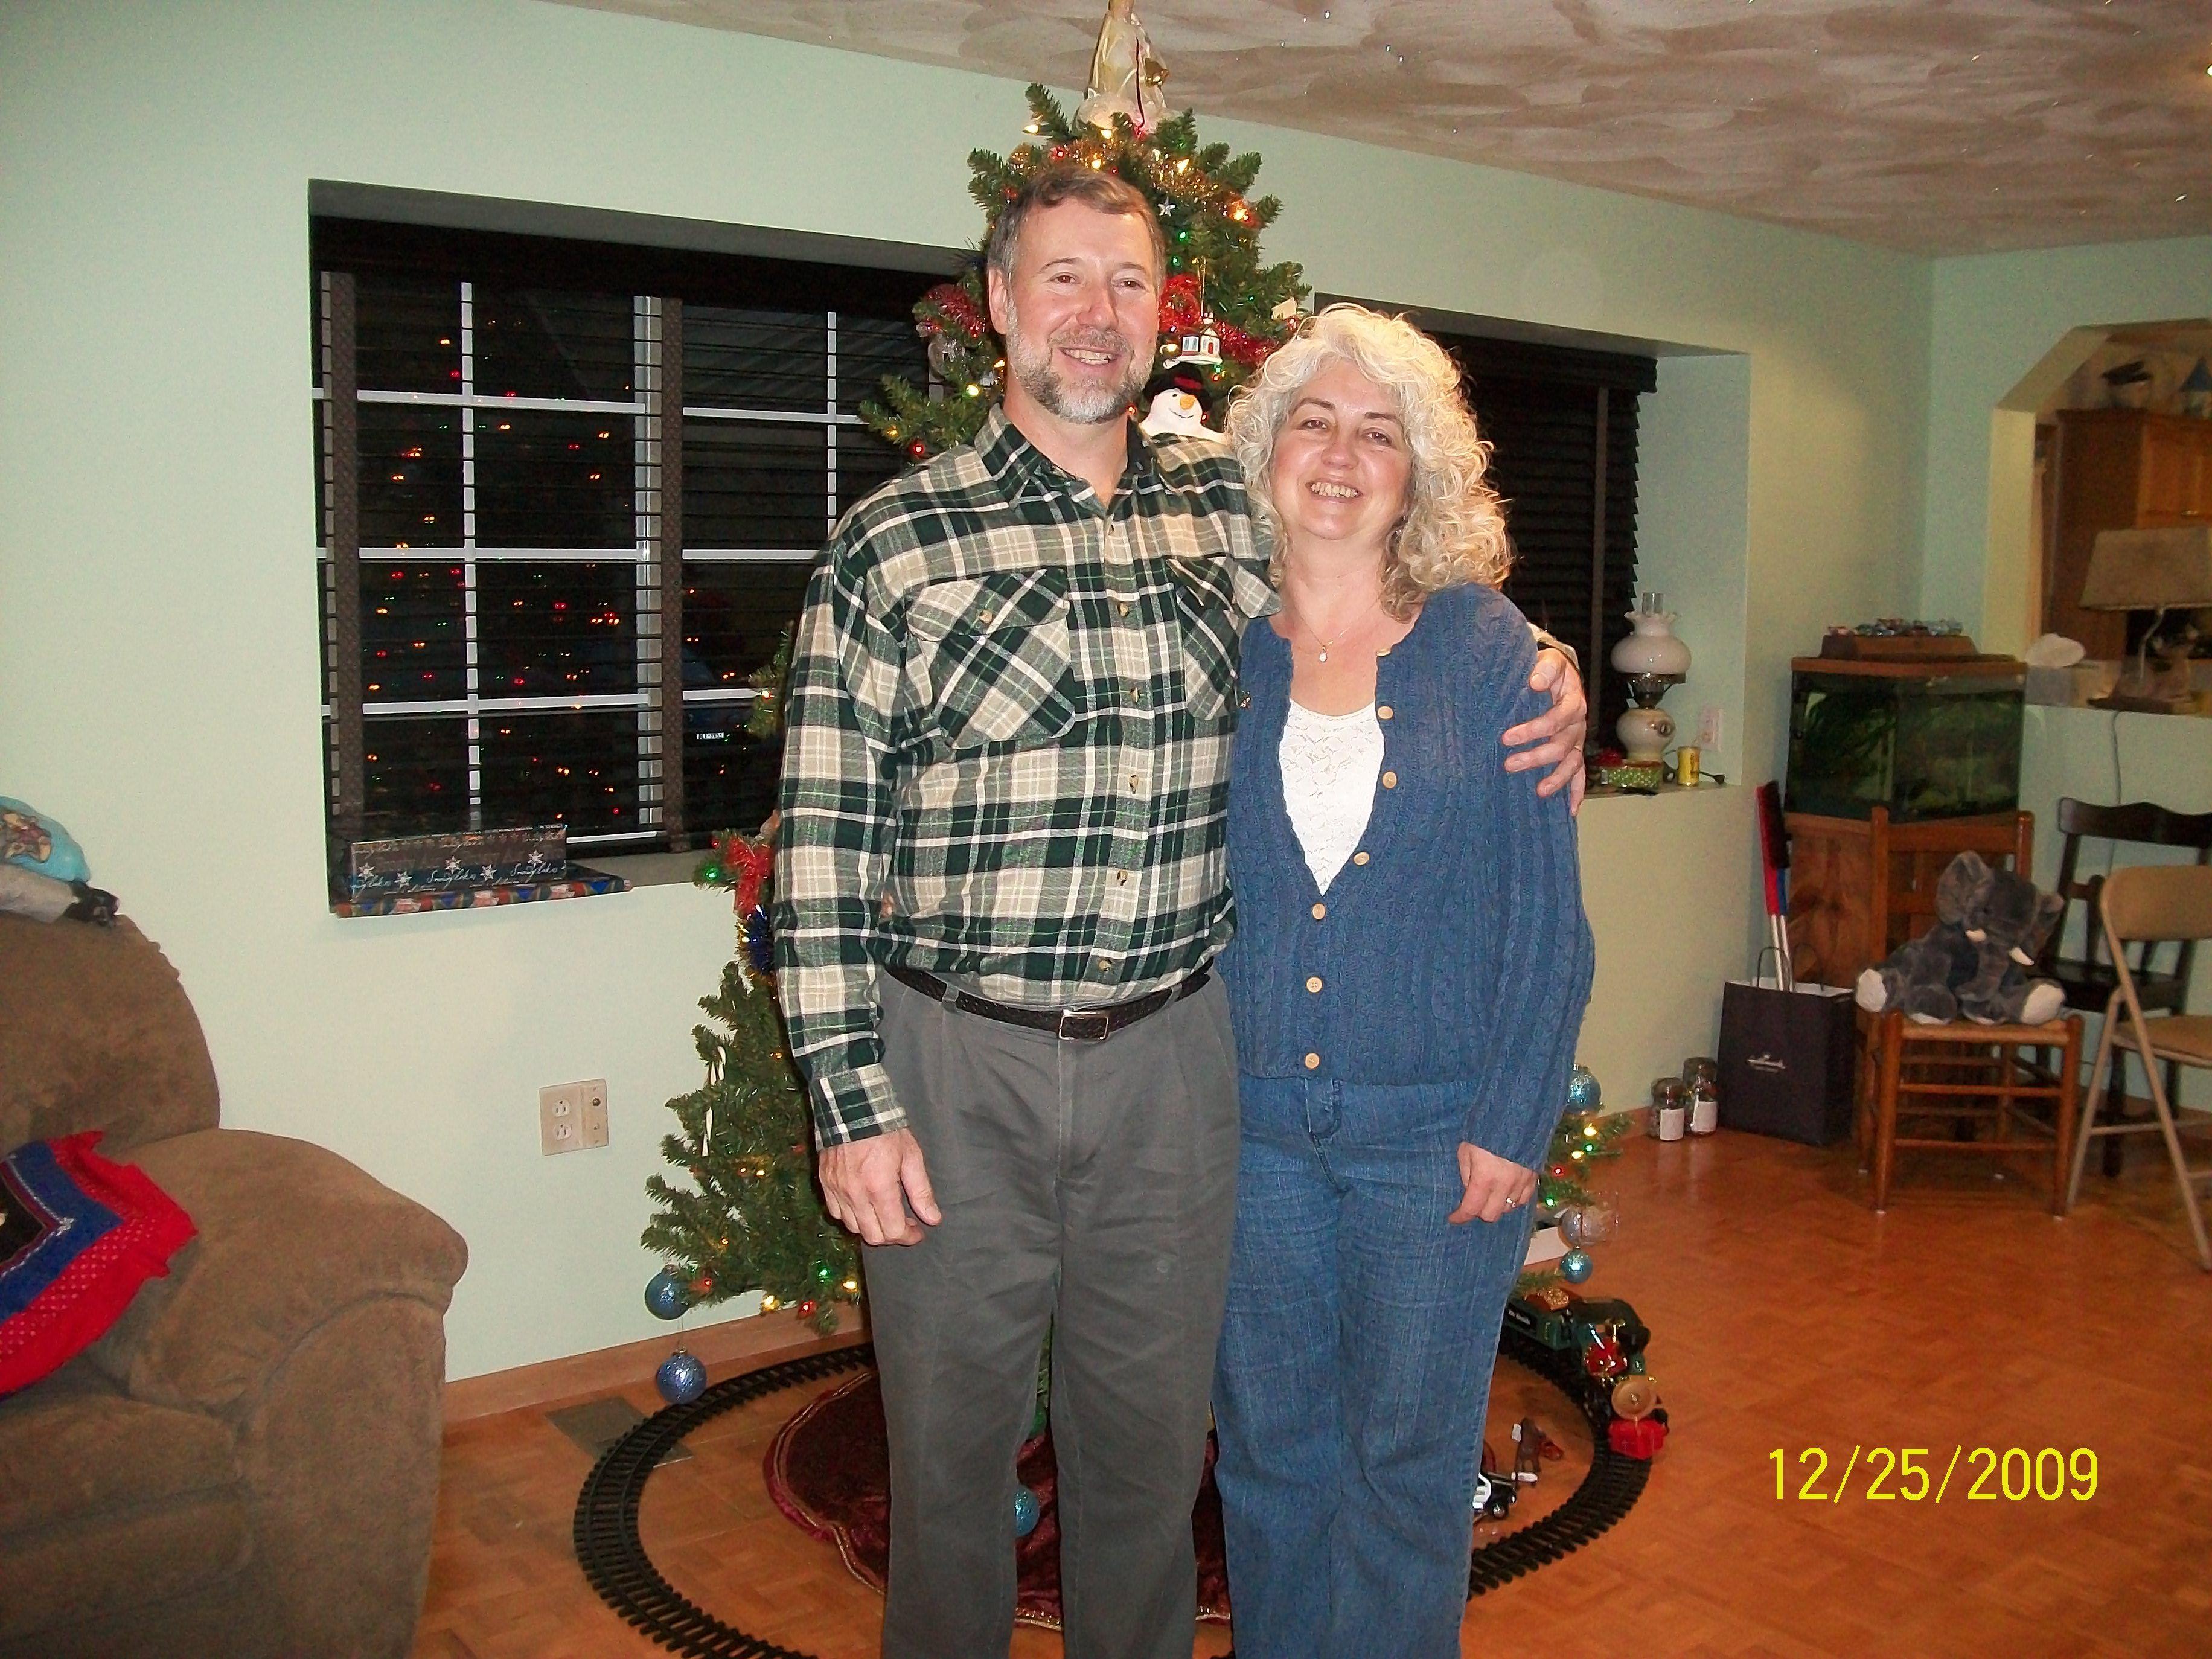 Tom & CindyKay Clark (formerly CindyKay Call)